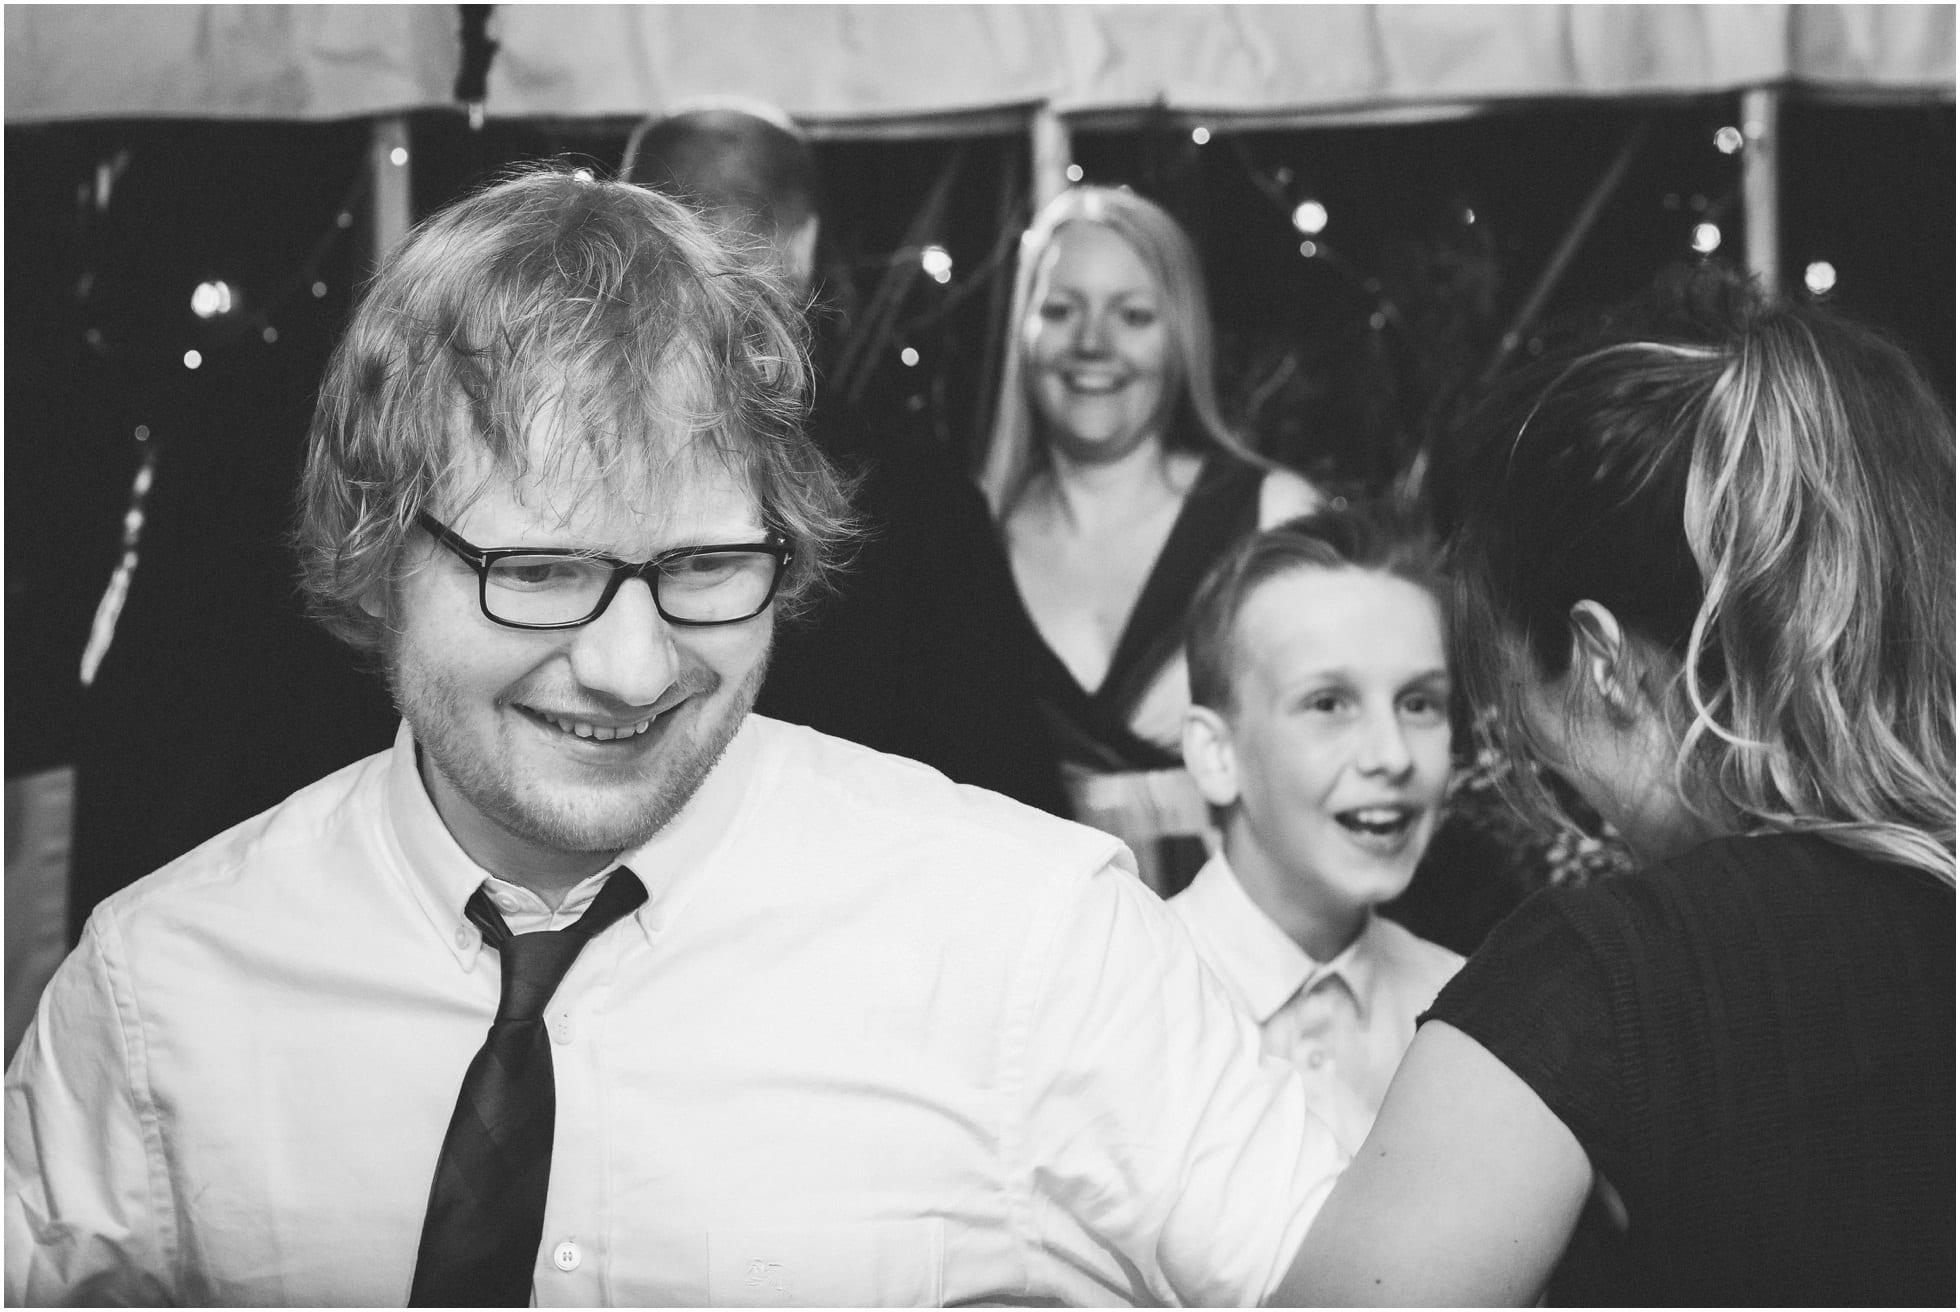 Ed Sheeran spinning his partner at York wedding